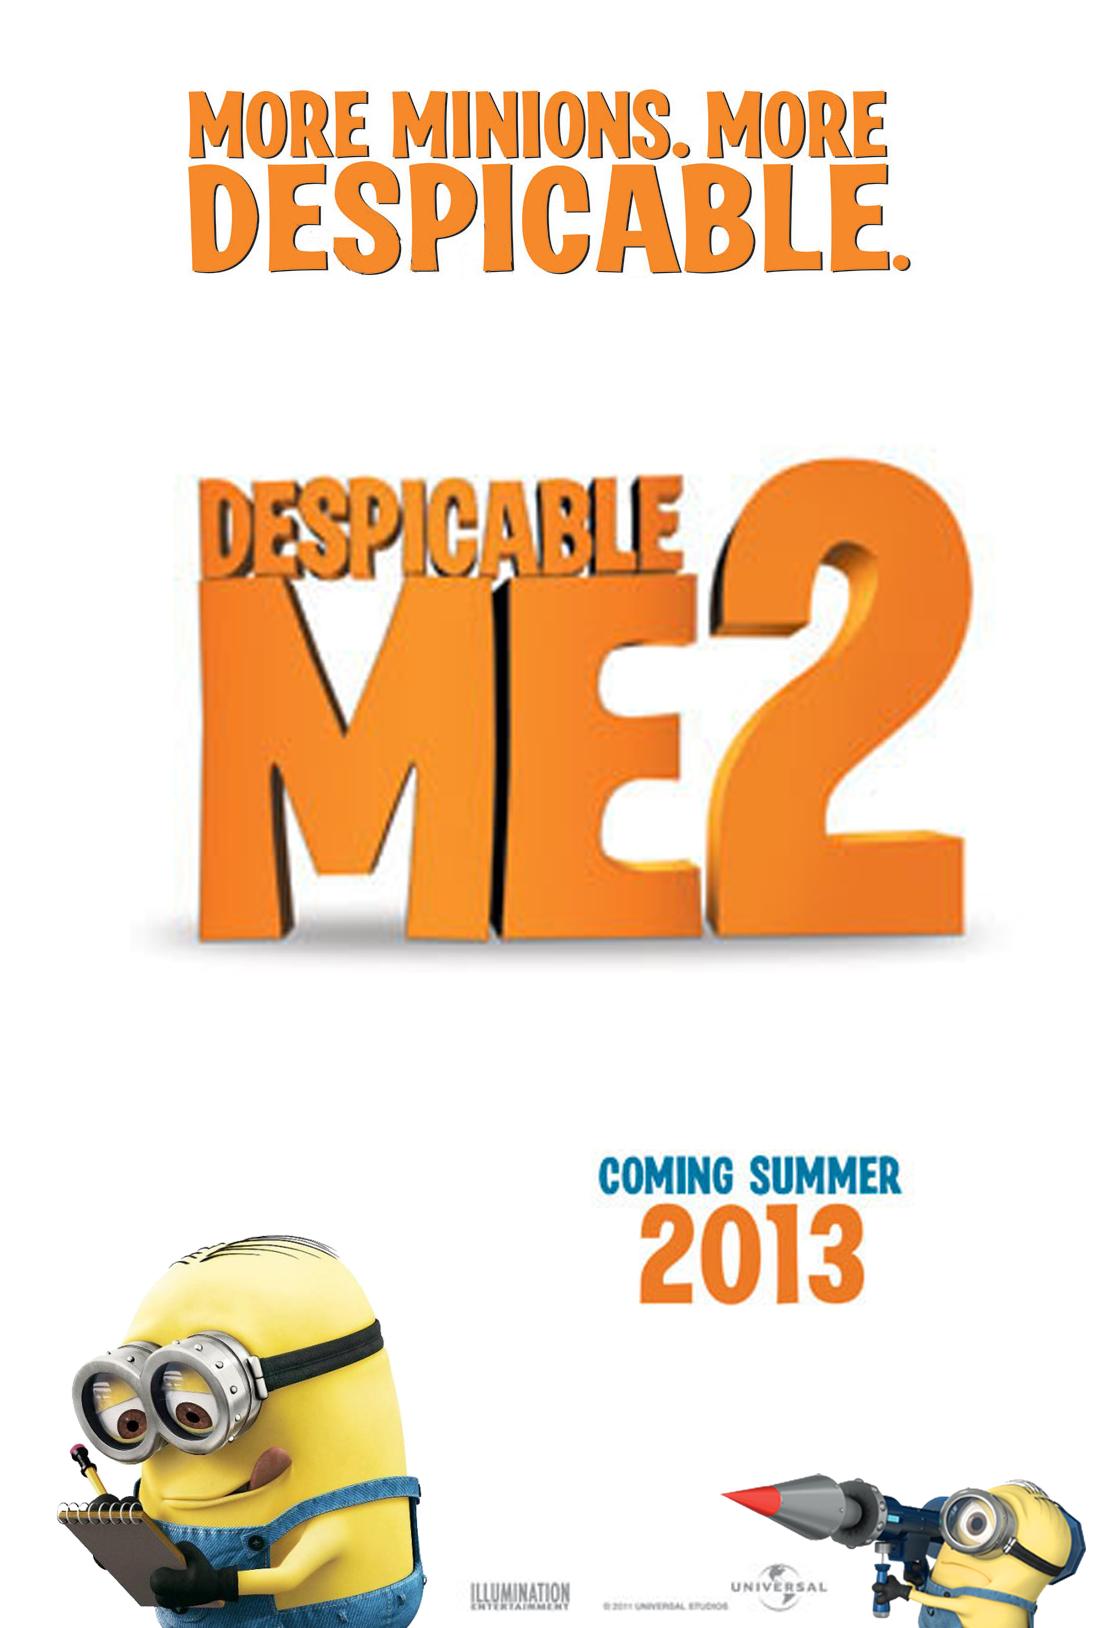 Despicable Me 2 - Movie Poster #4 (Original)